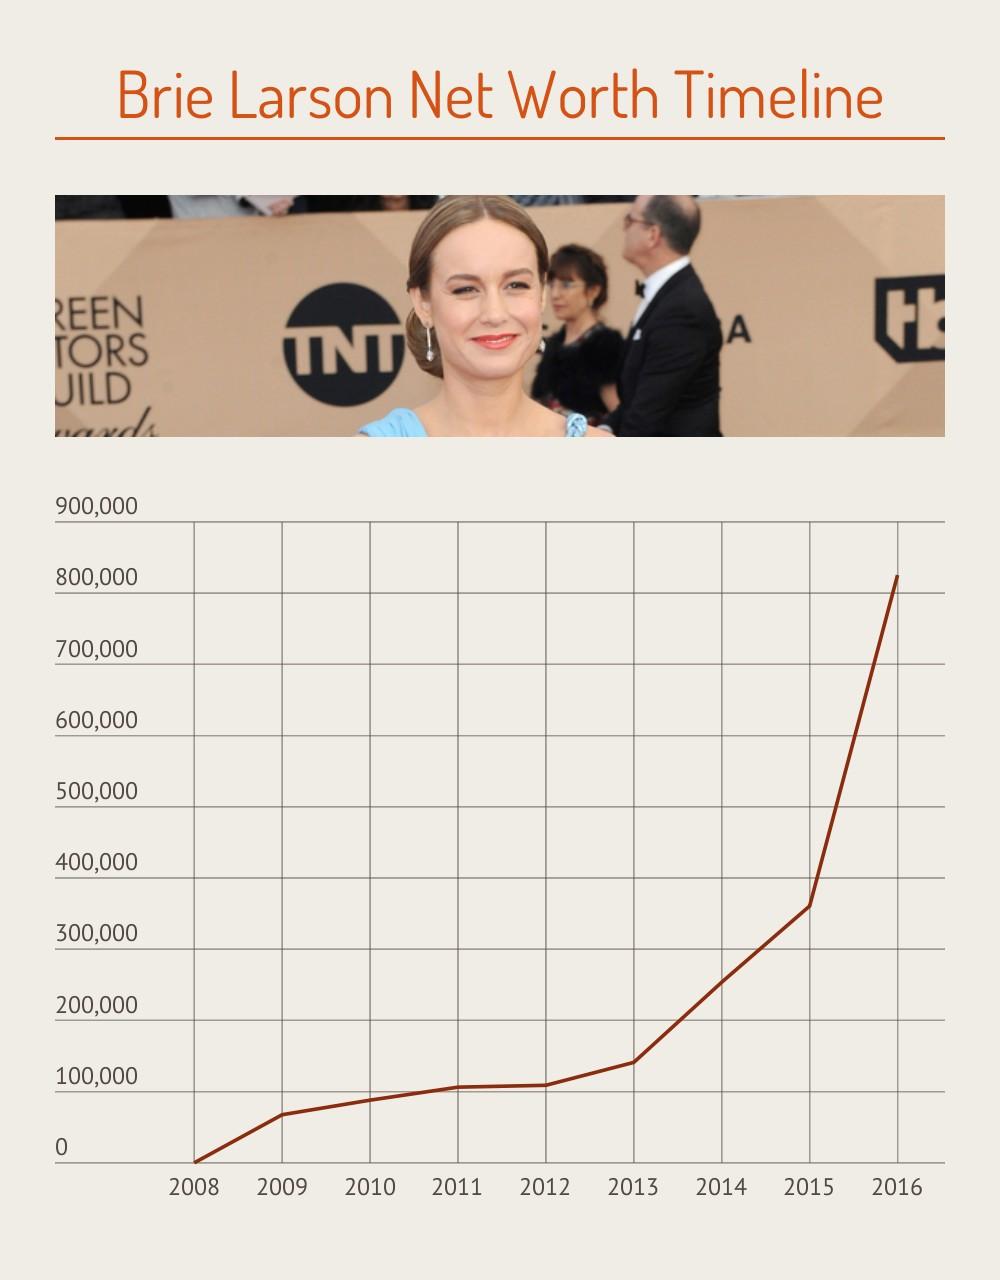 Brie Larson Net Worth Time